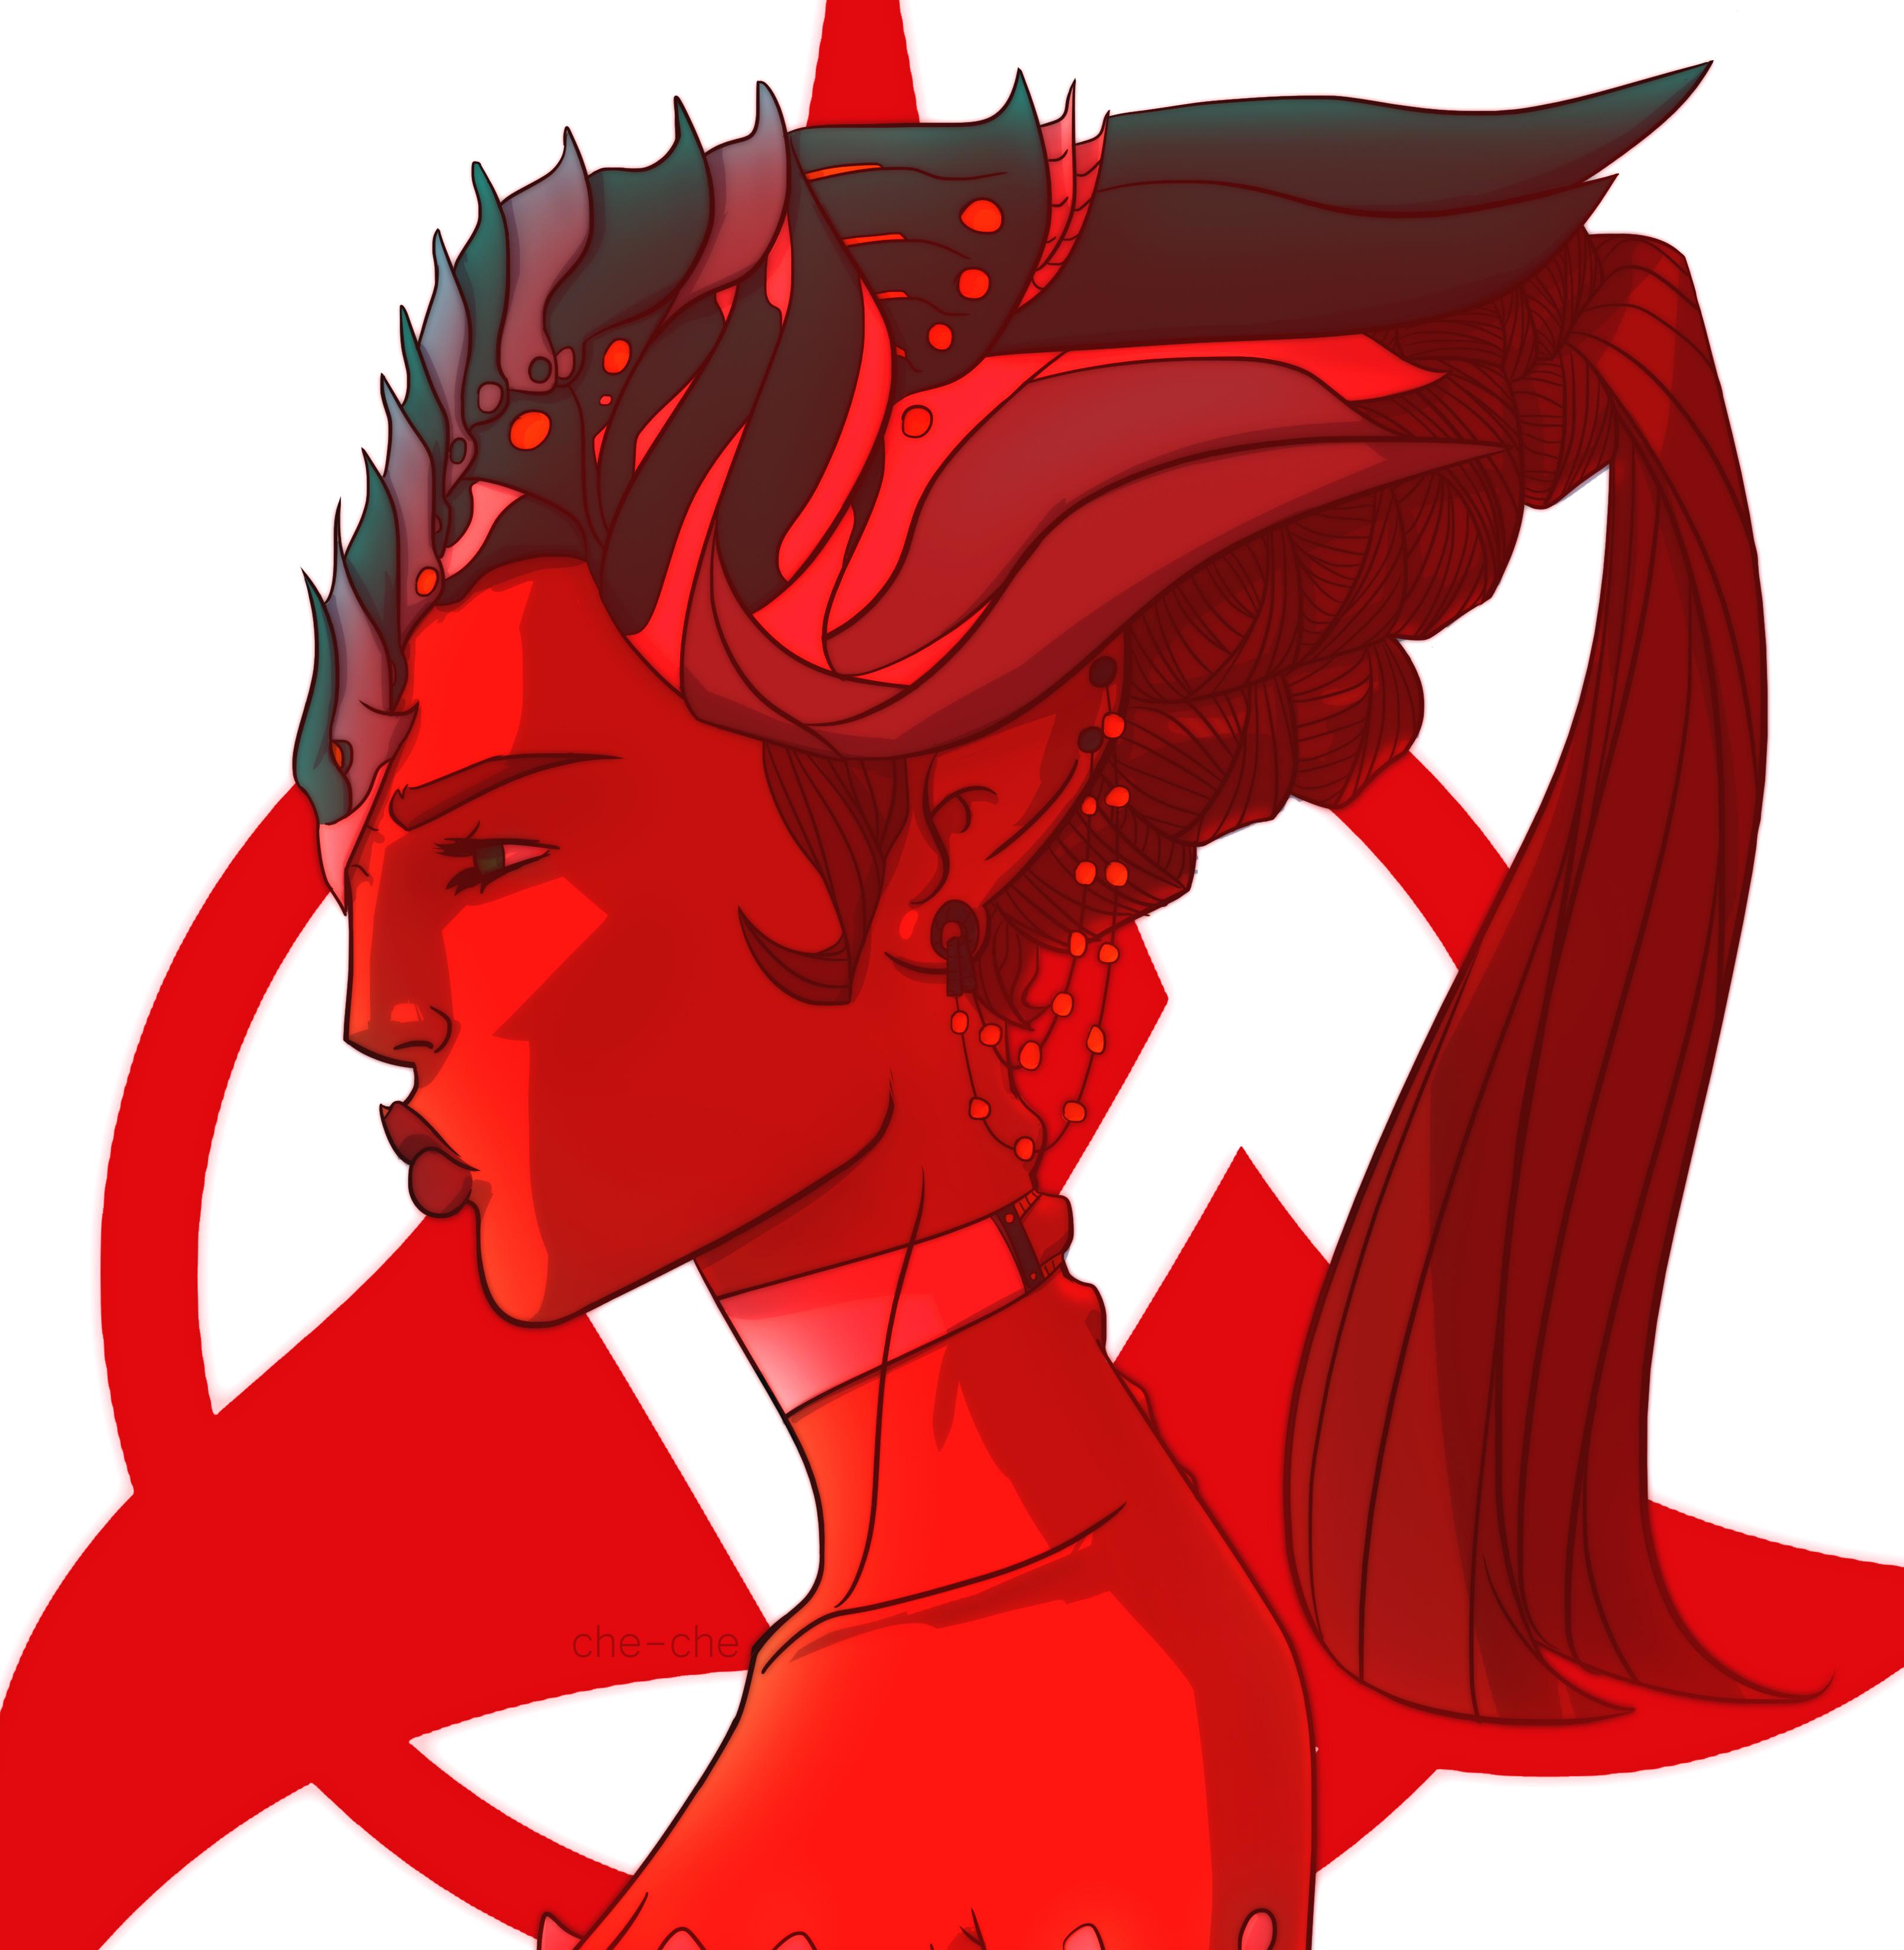 Klingon Royalty